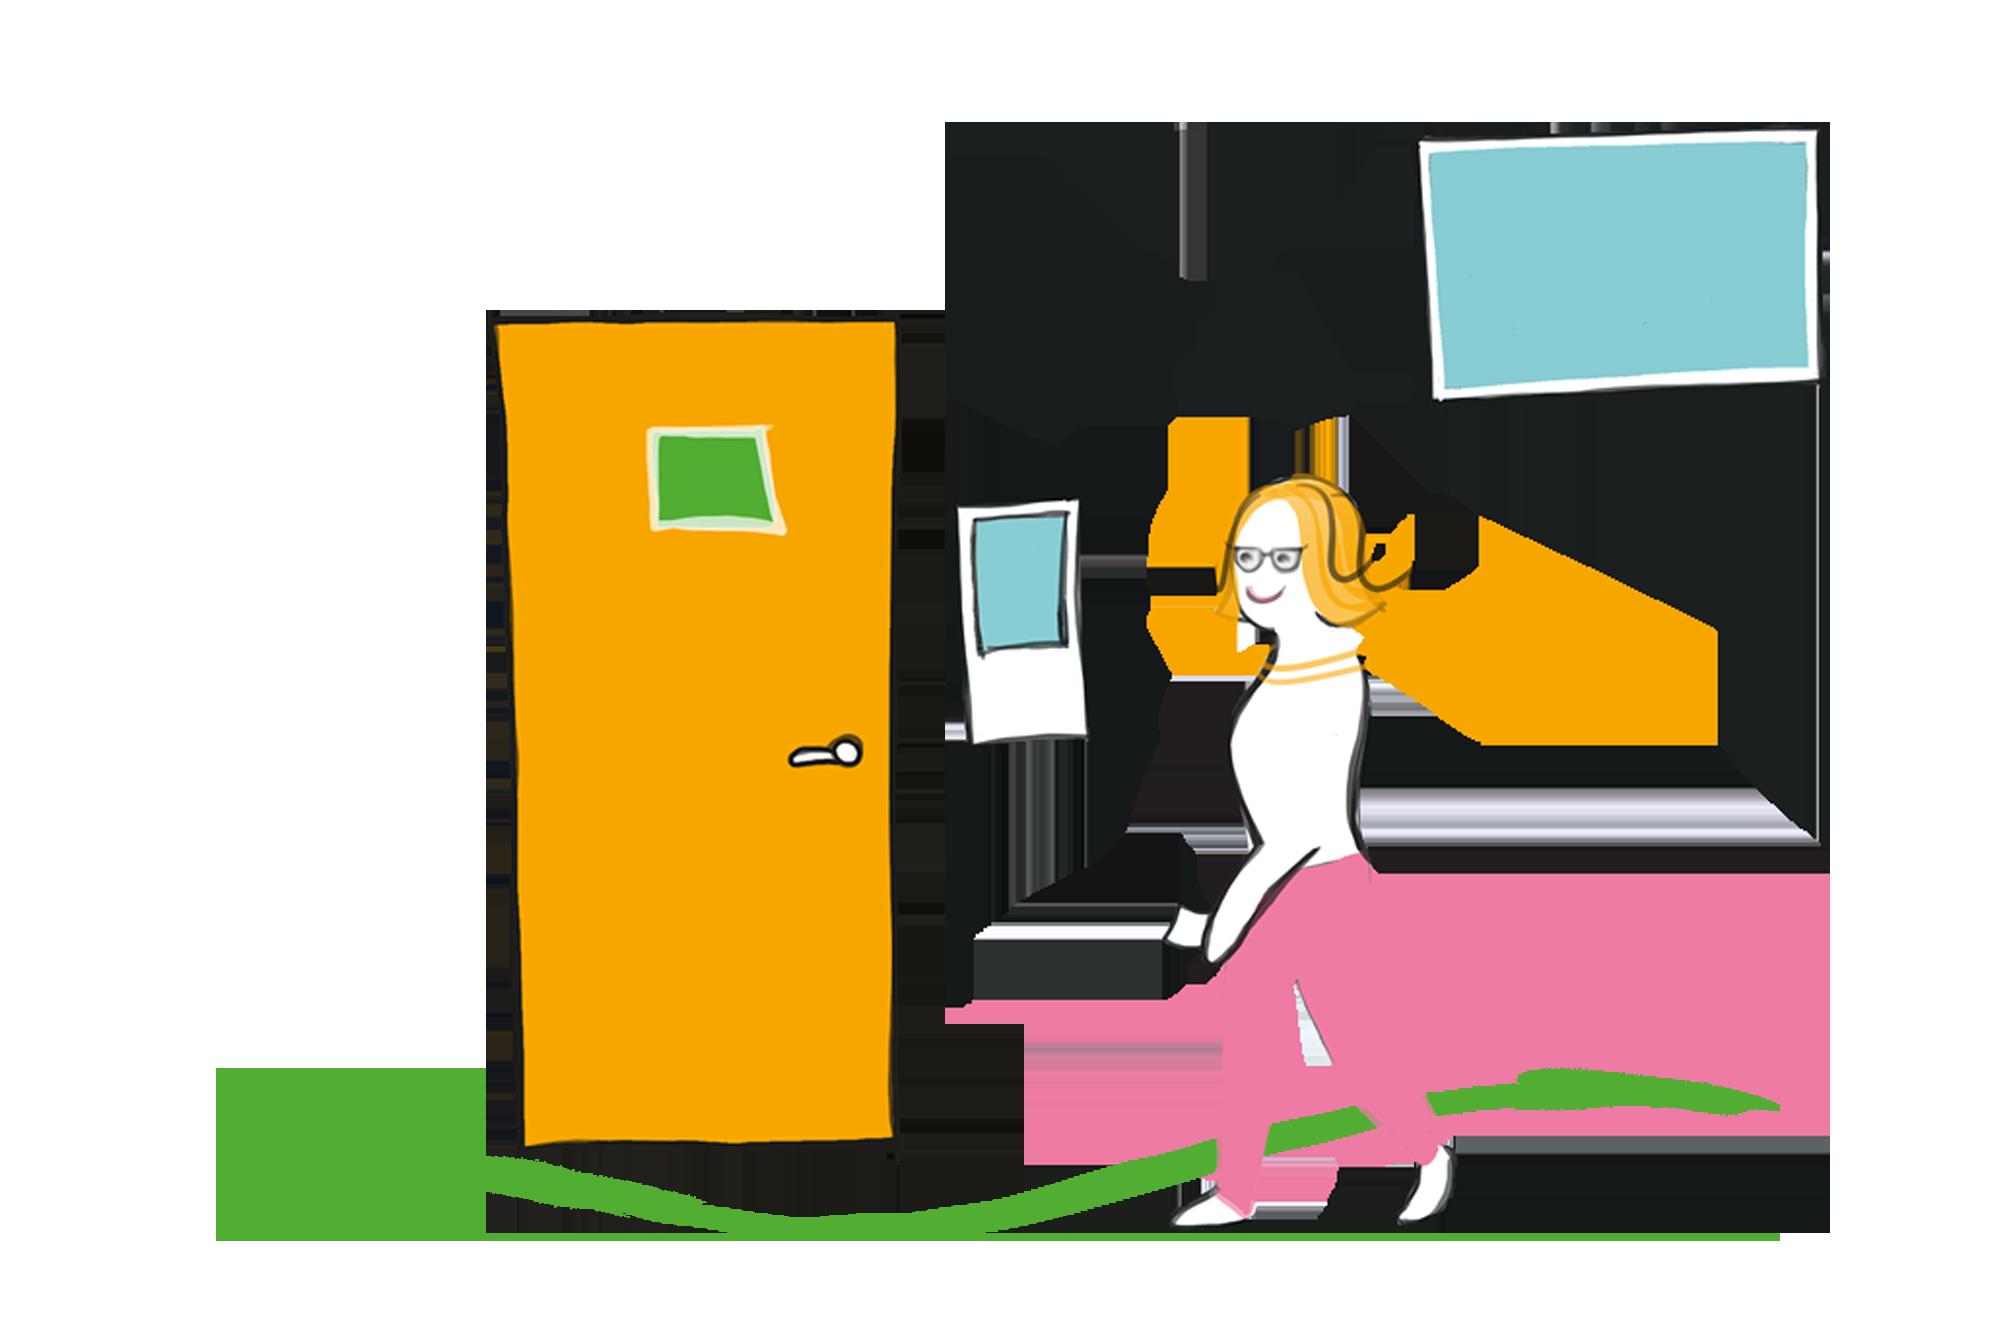 Patient entering a treatment room